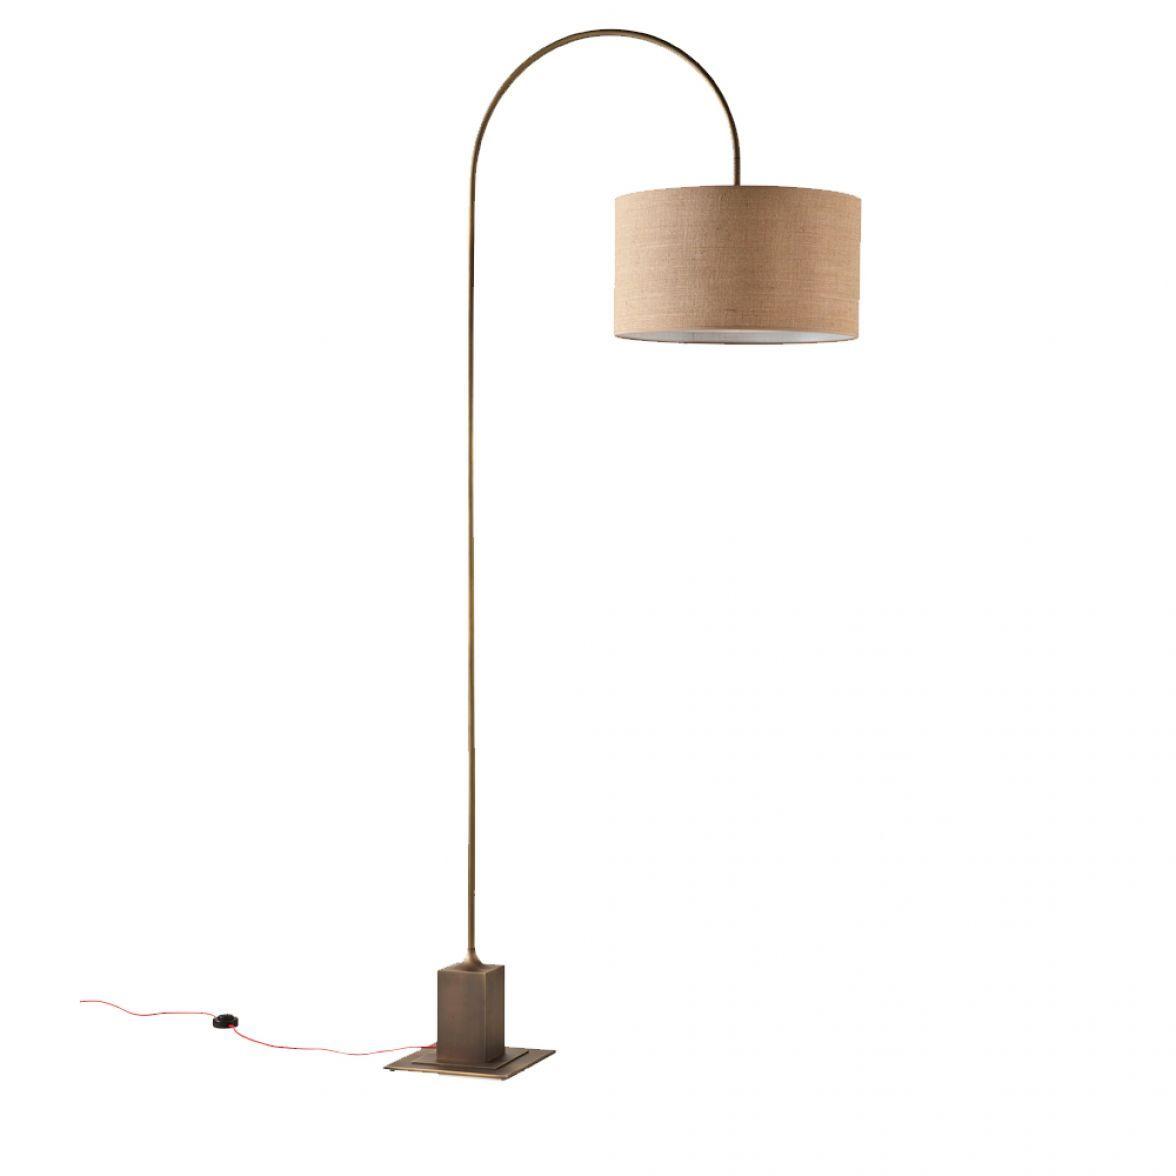 ISABELLA floor lamp